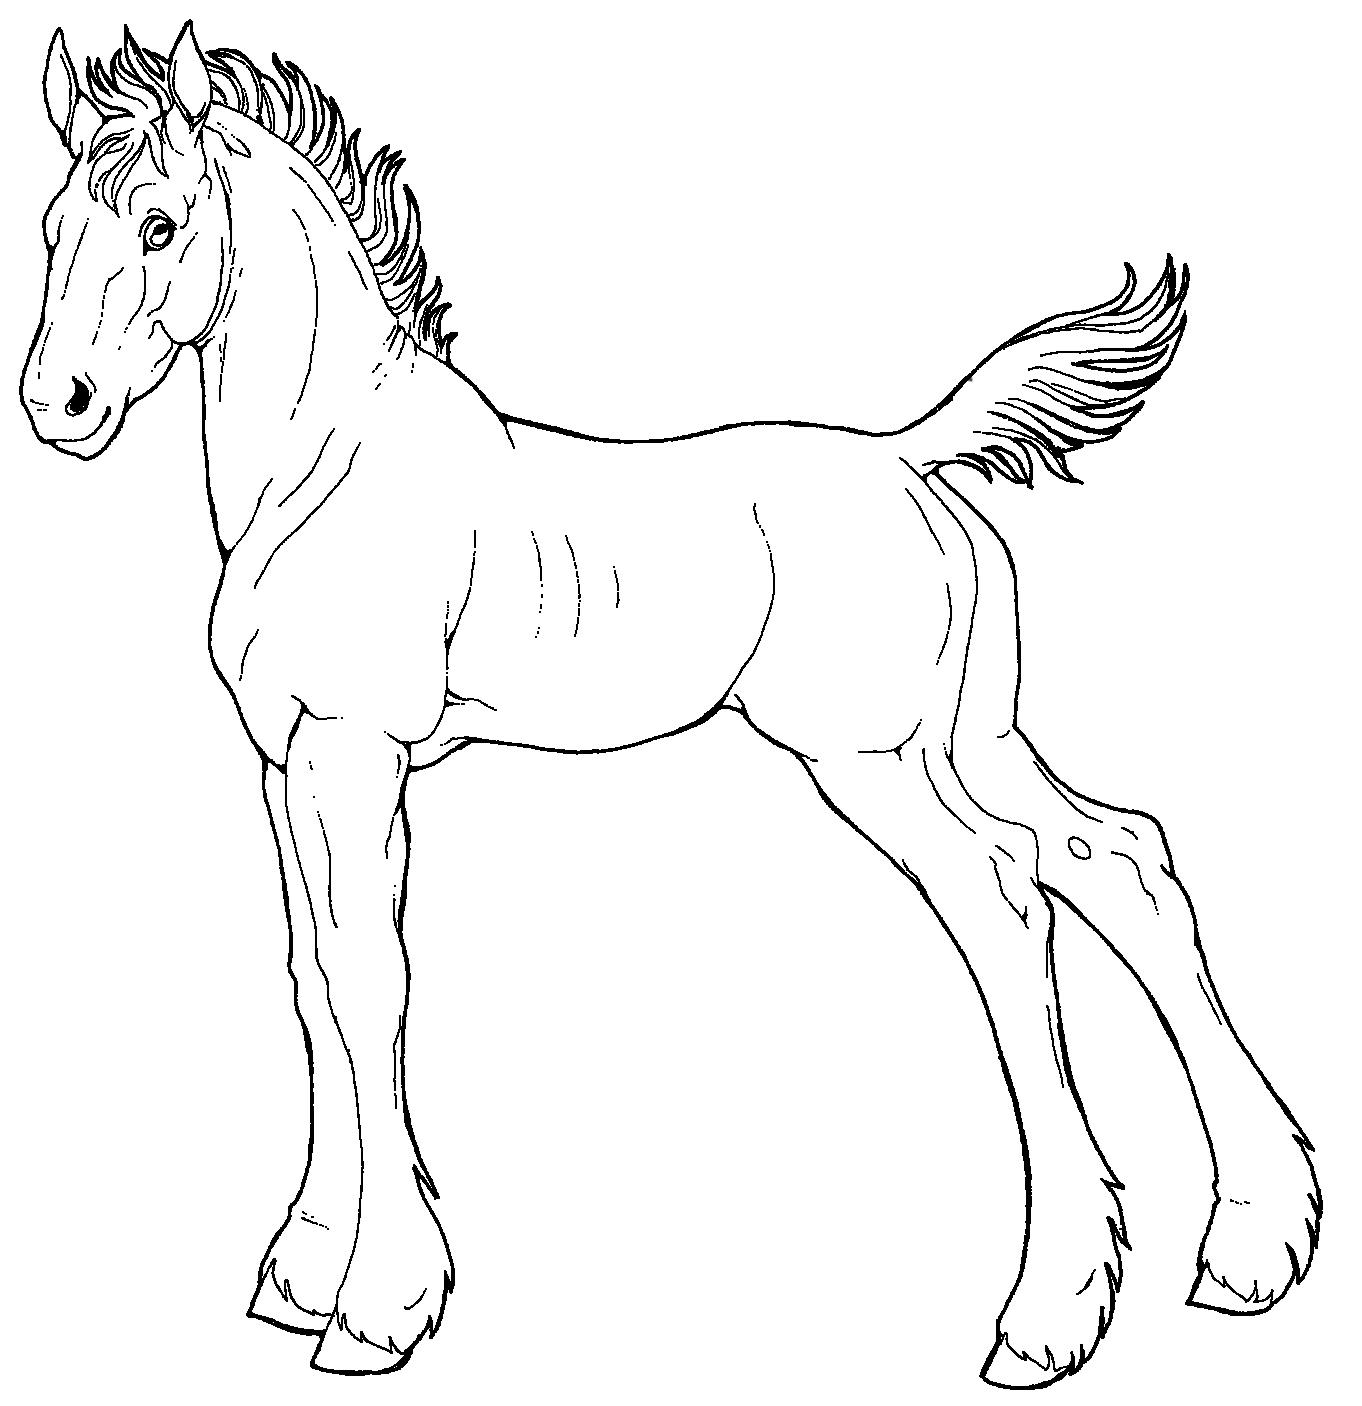 Line Drawing Of Horse : Free line art draft foal by applehunter on deviantart